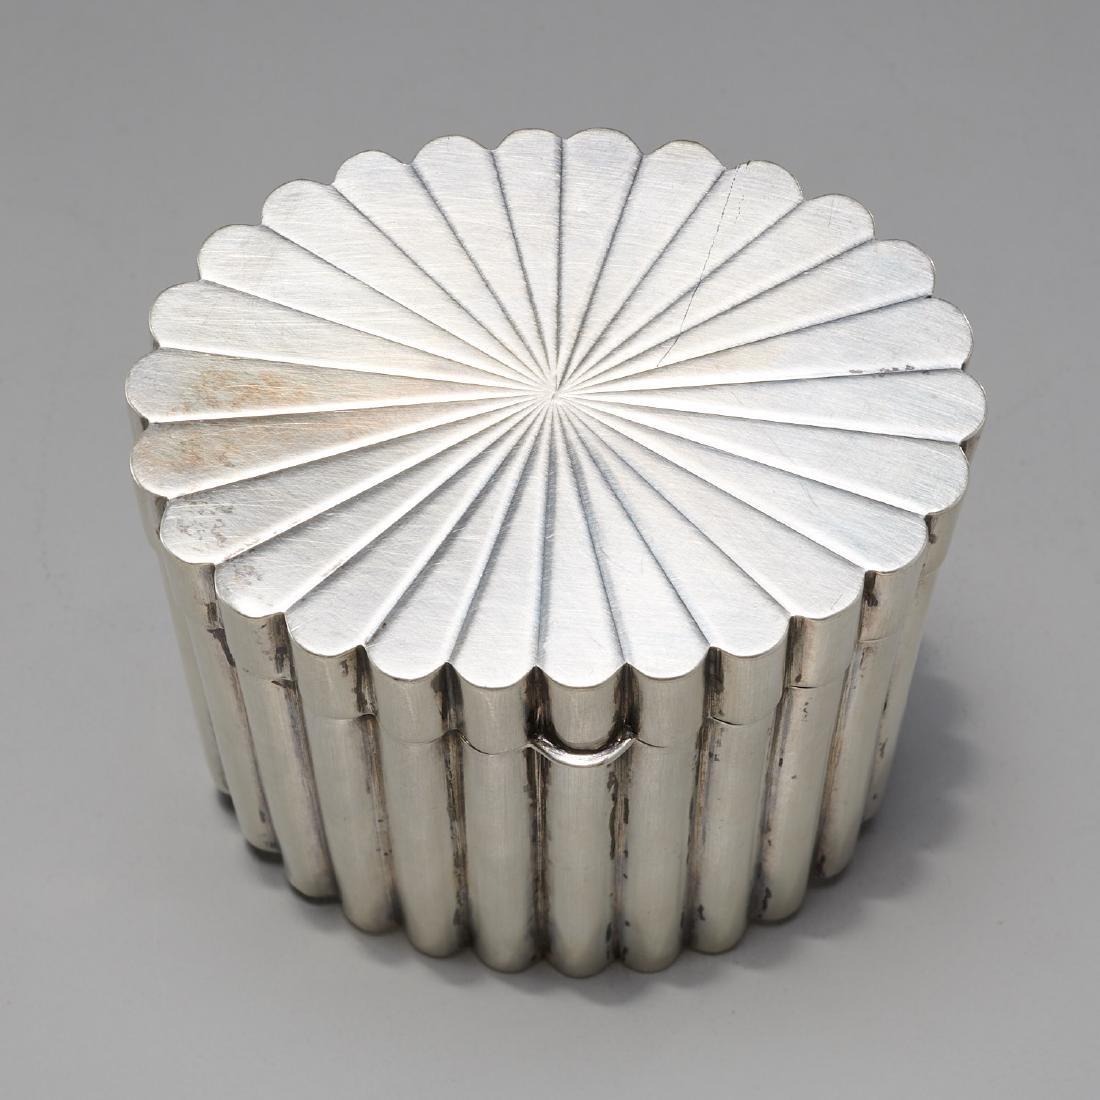 Tiffany & Co. Art Deco silver lidded box - 2